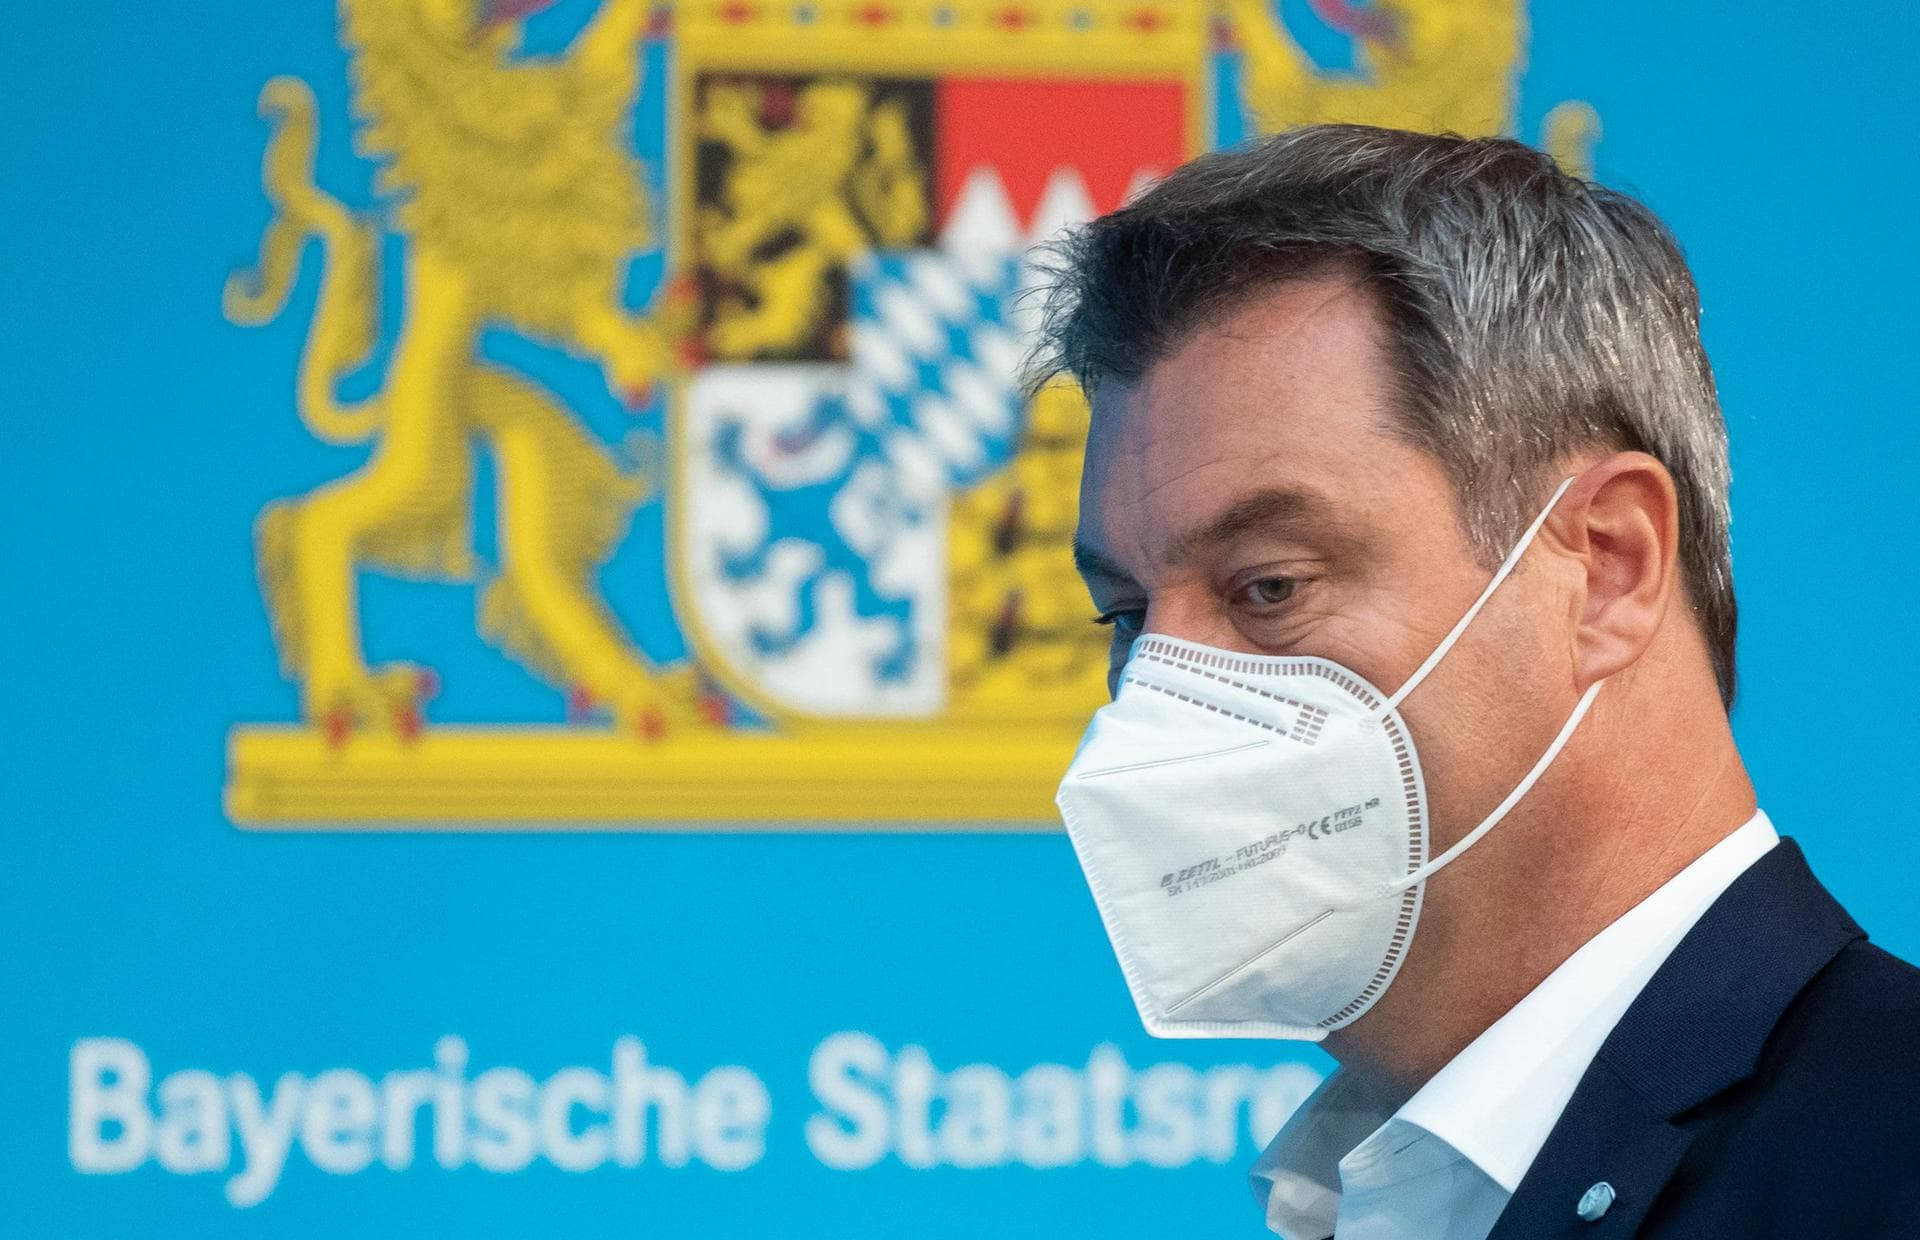 Söder rüffelt Umweltminister Glauber Klima-Missstimmung im Kabinett